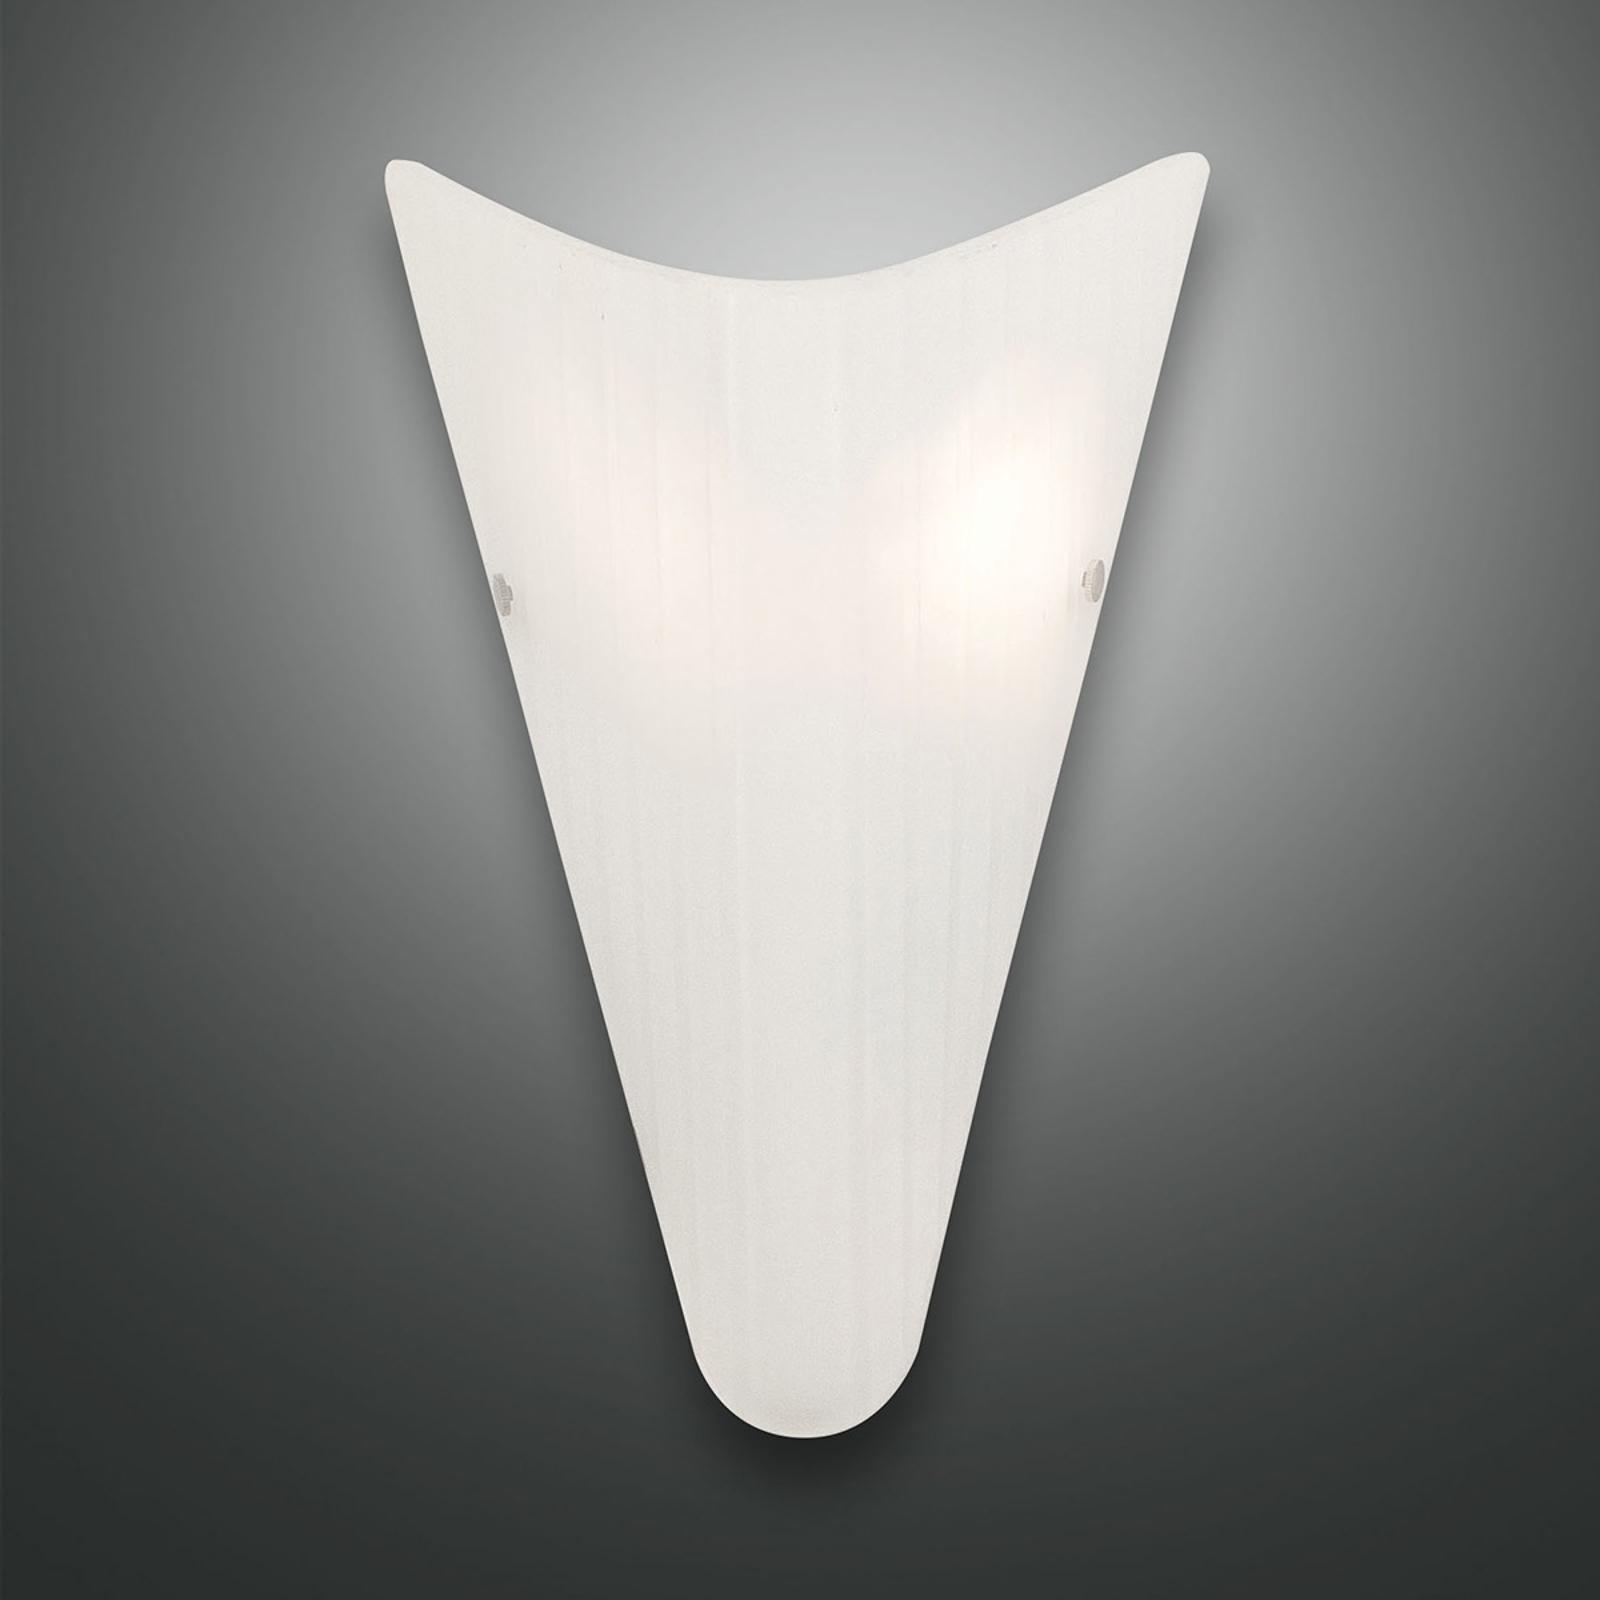 Wandlamp Fly met glazen kap, wit